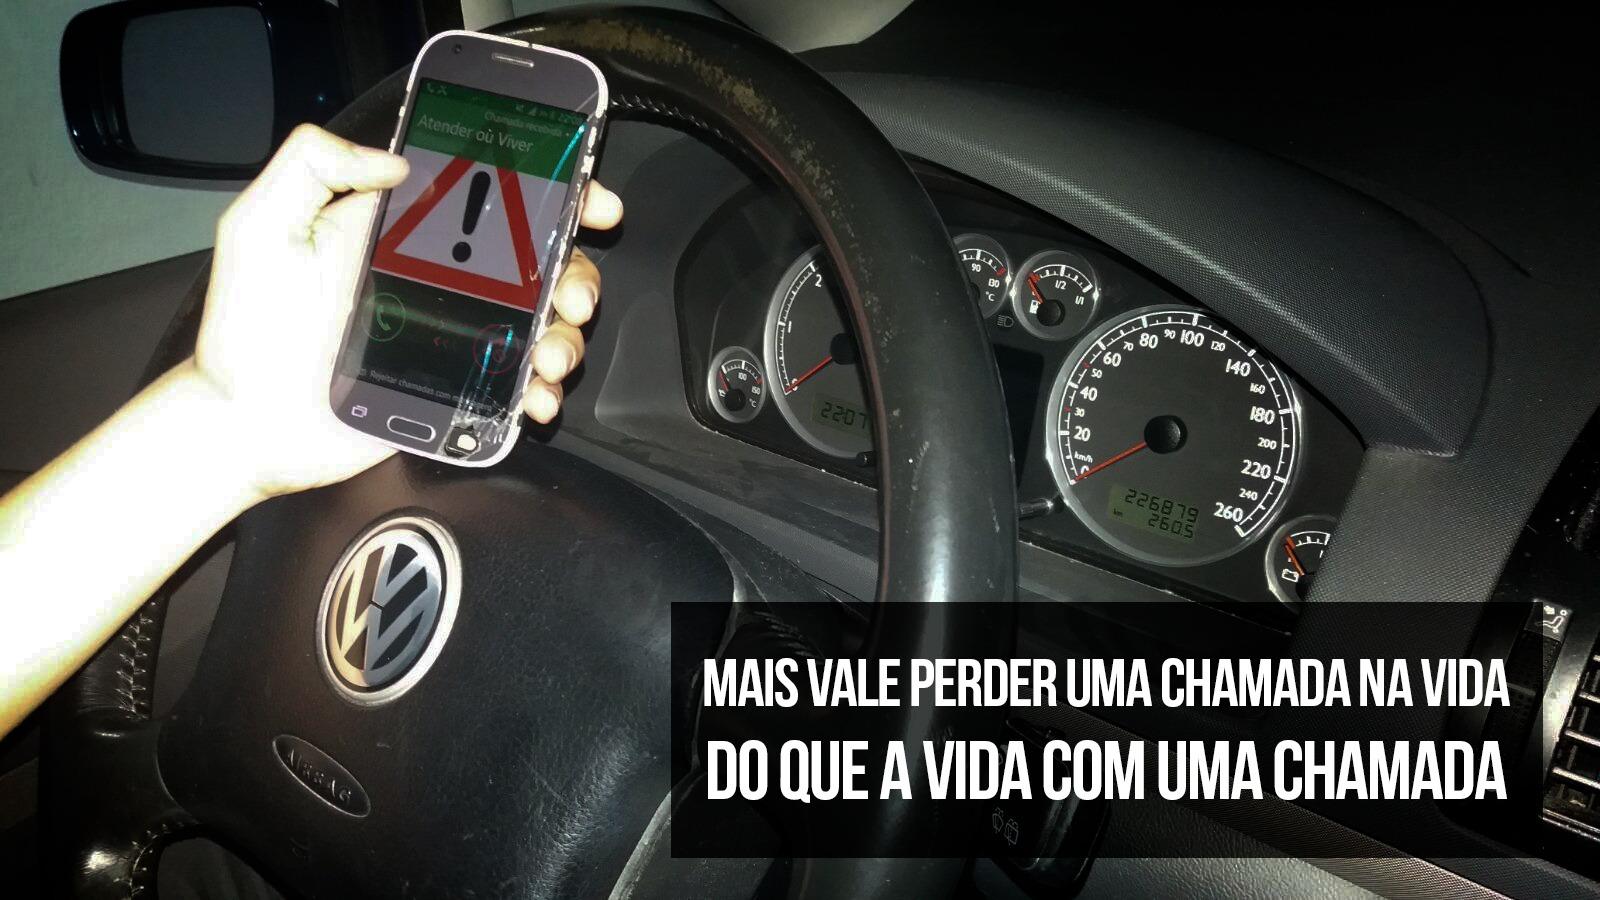 Os Rodinhas img-20170308-wa0006